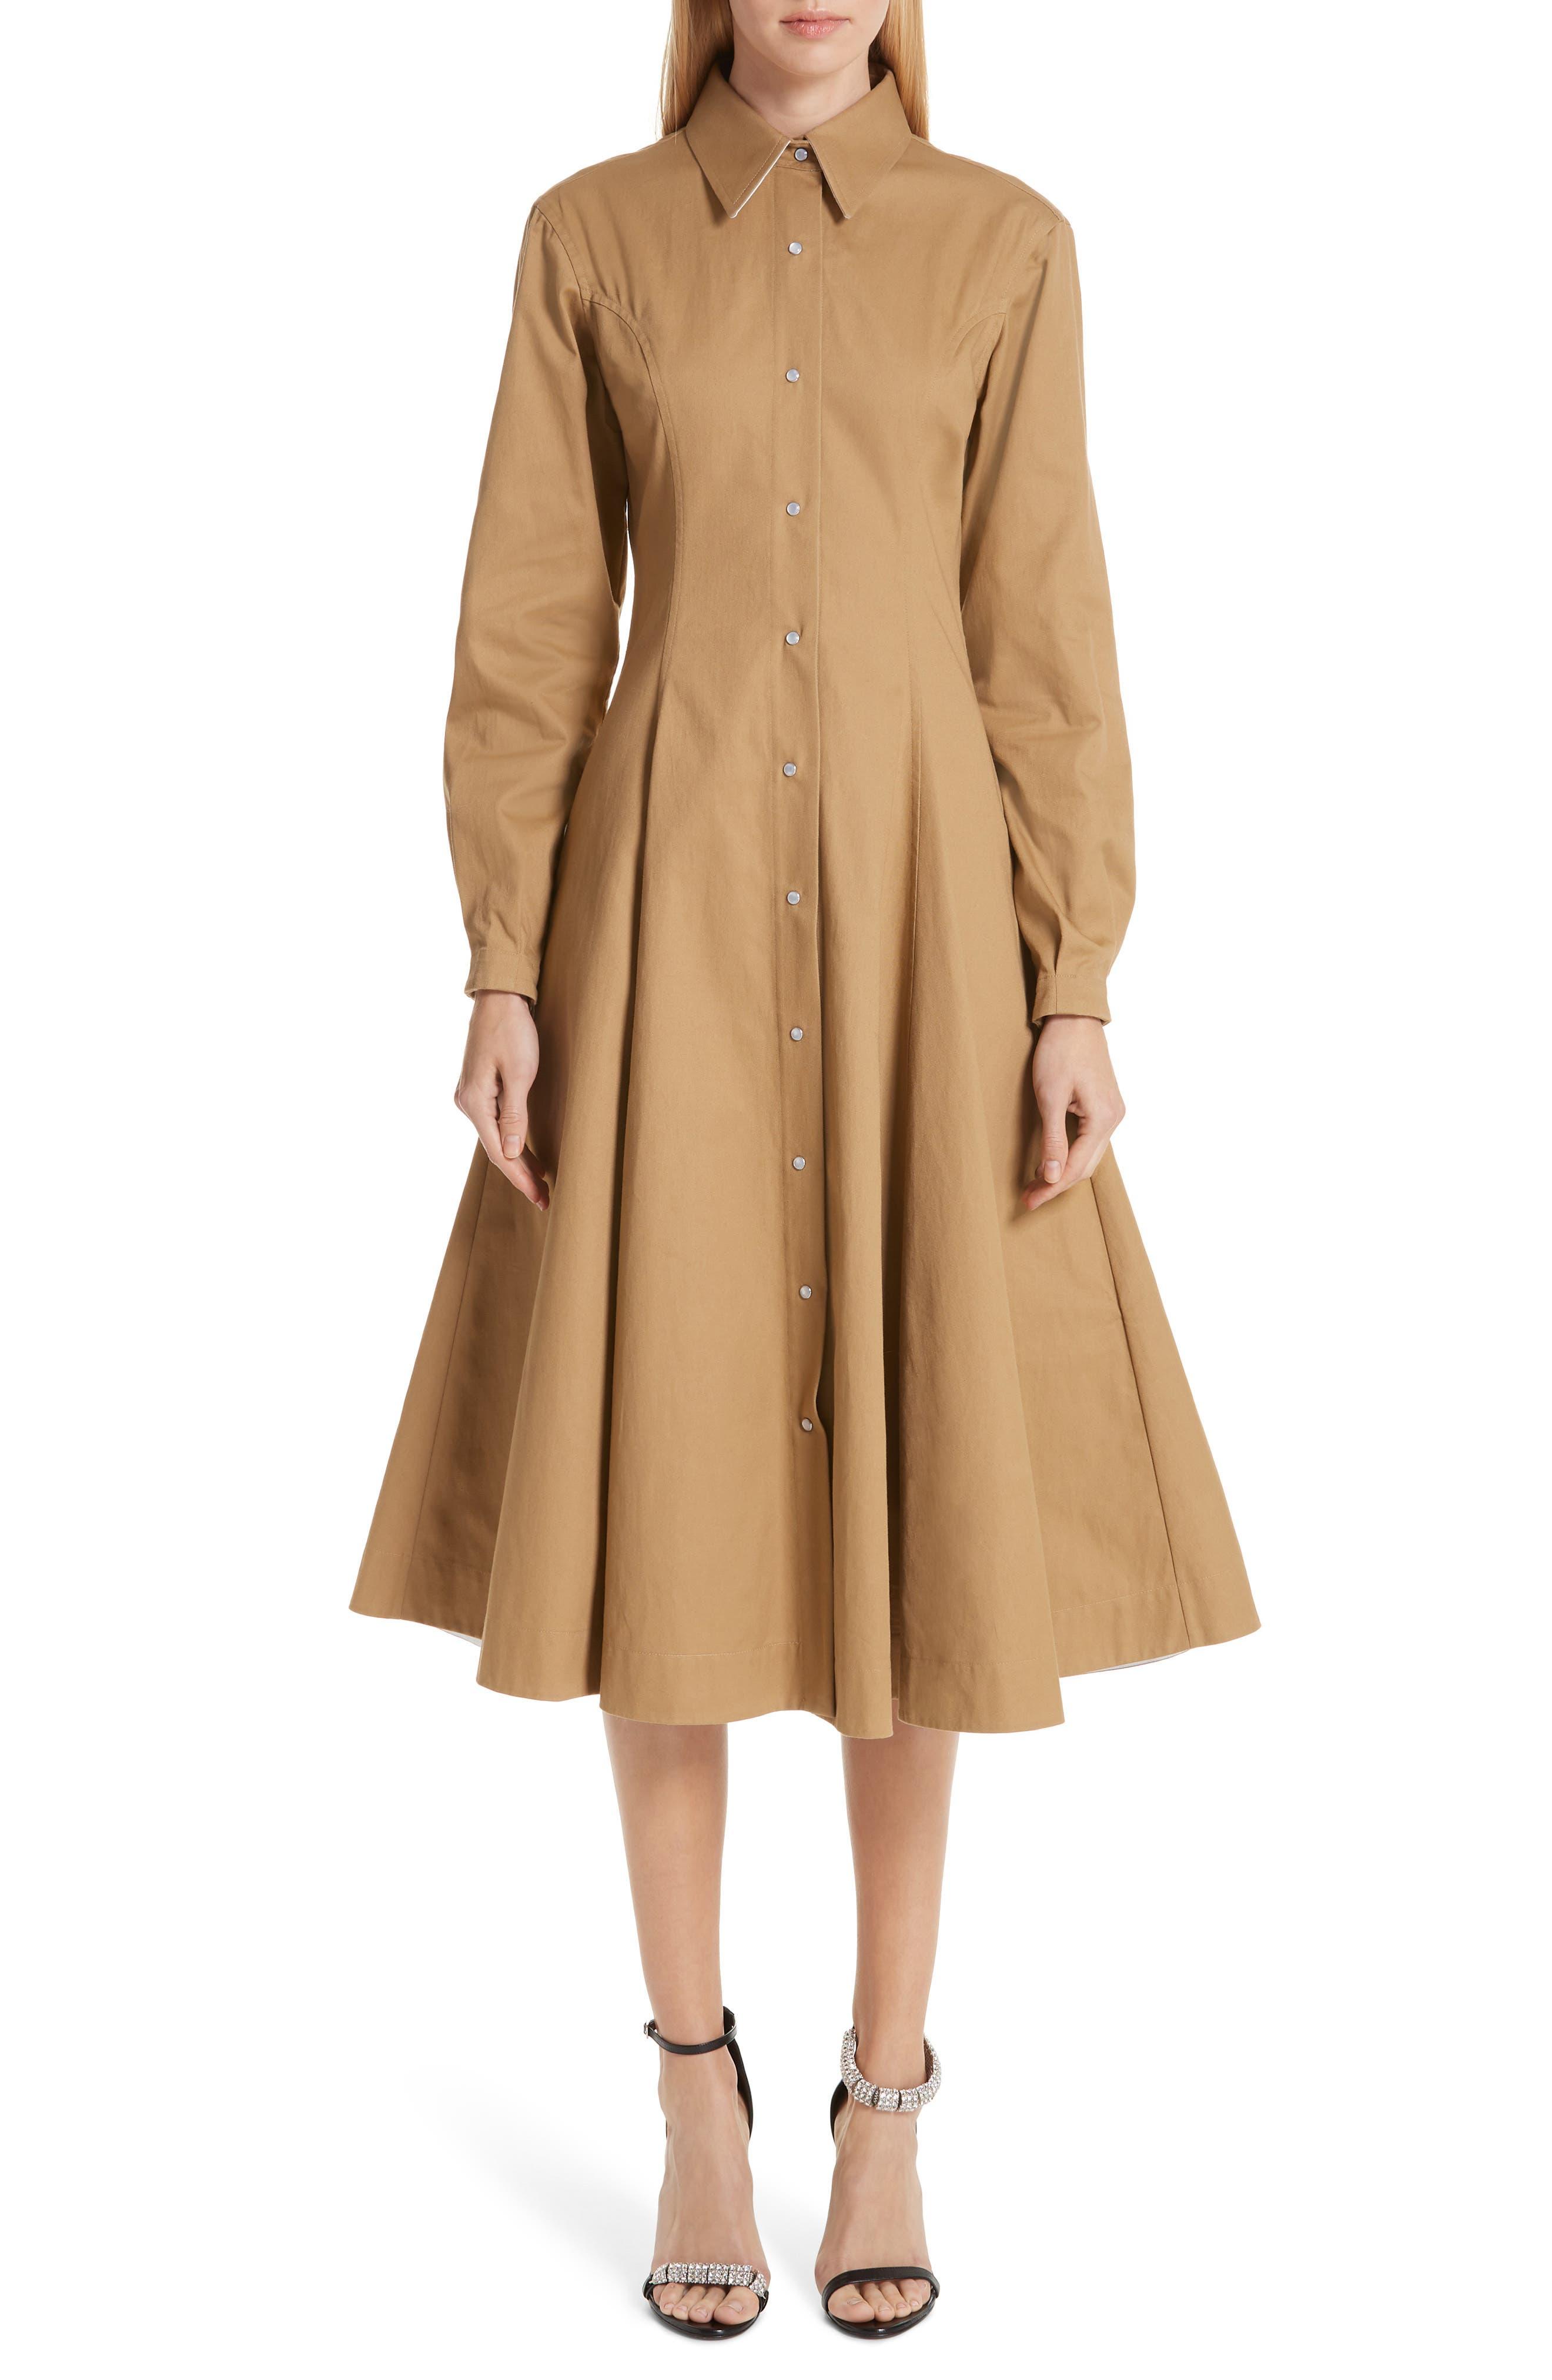 CALVIN KLEIN 205W39NYC Western Twill A-Line Midi Dress, Main, color, DUNE